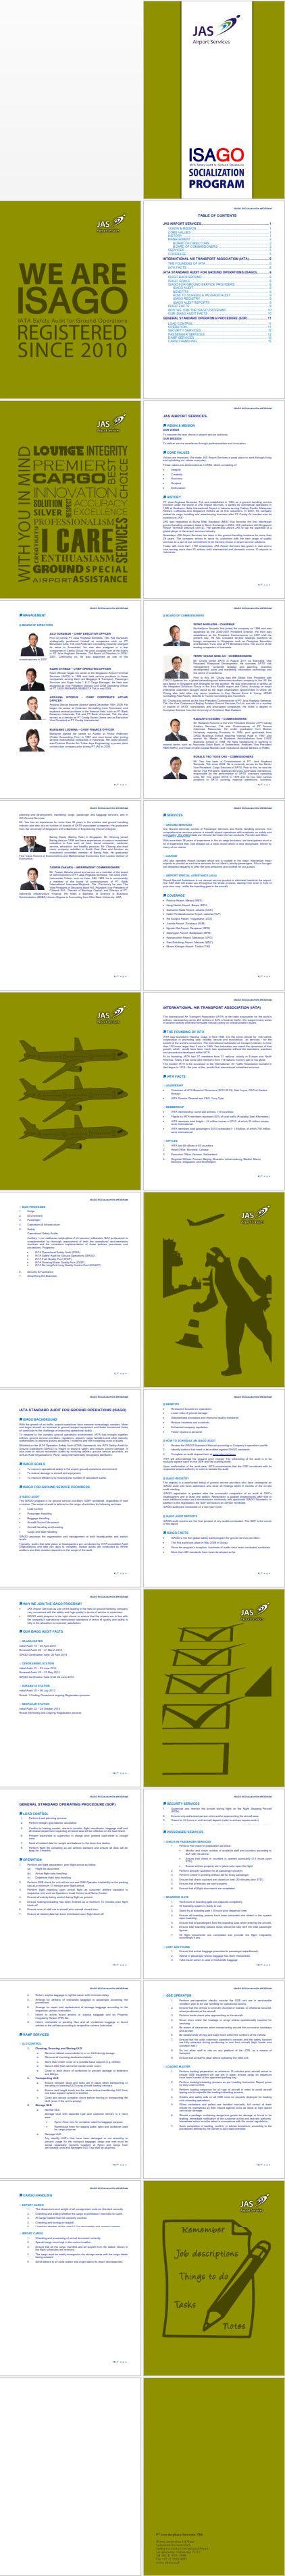 Poster design using gimp - Booklet Design Work Using Gimp